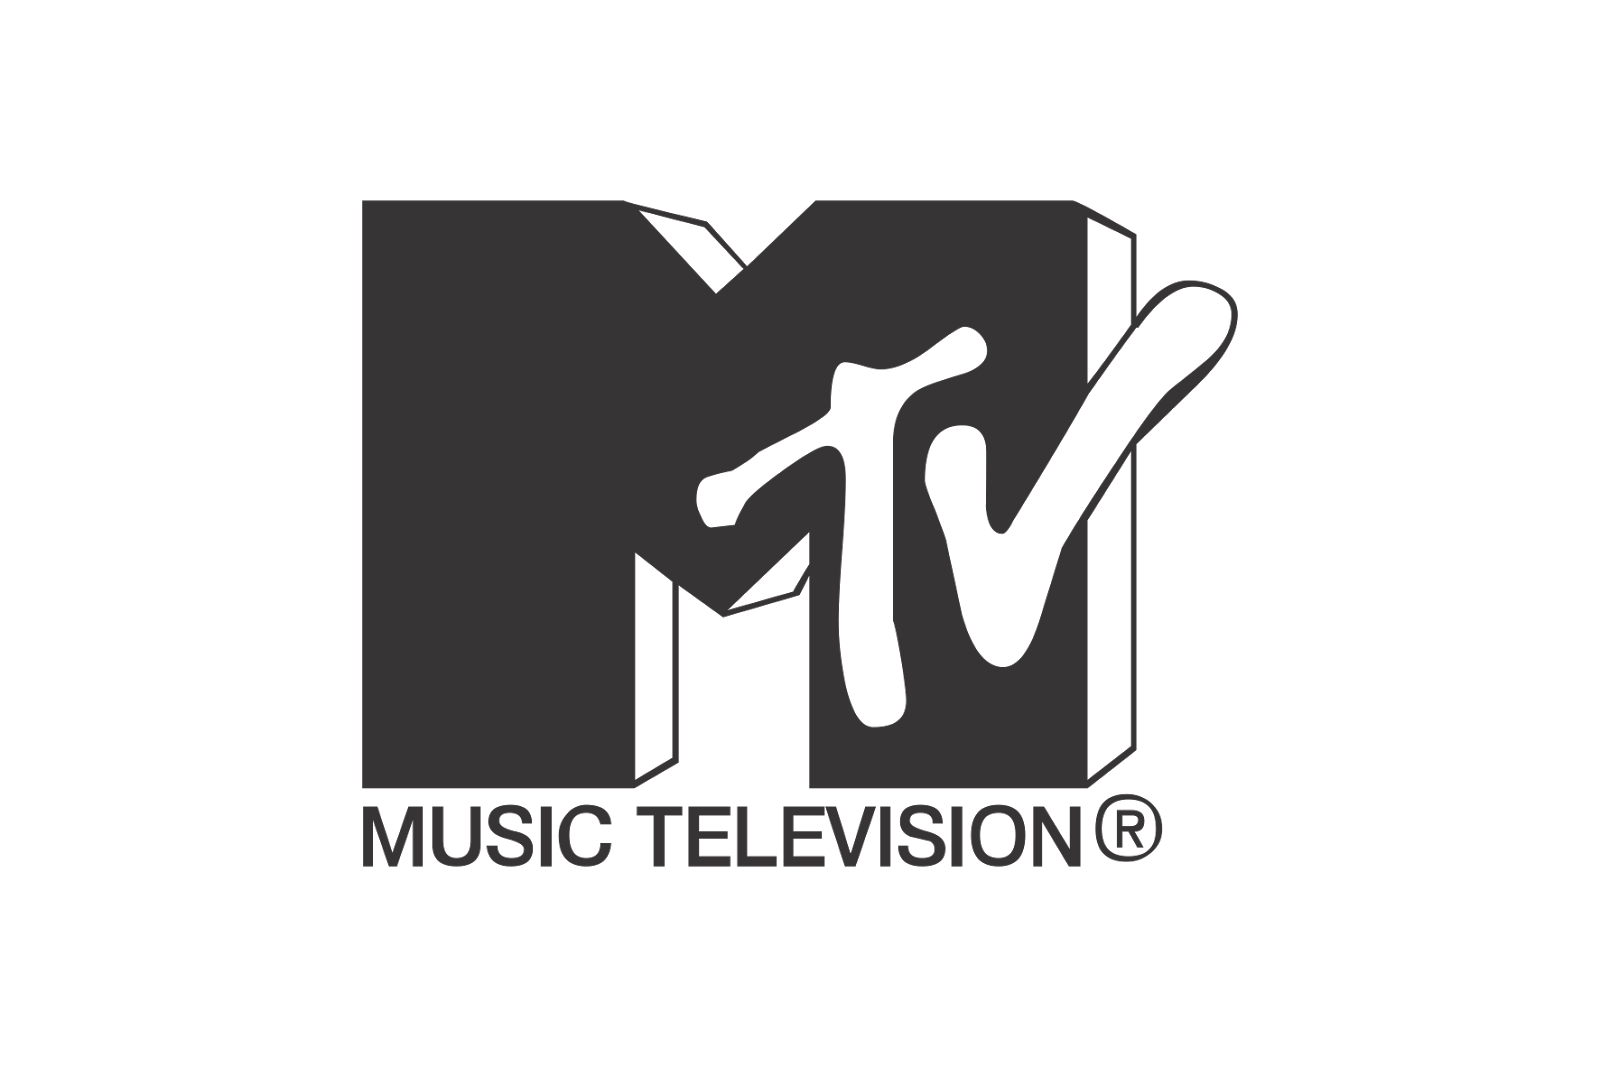 old music mtv png logo #3193